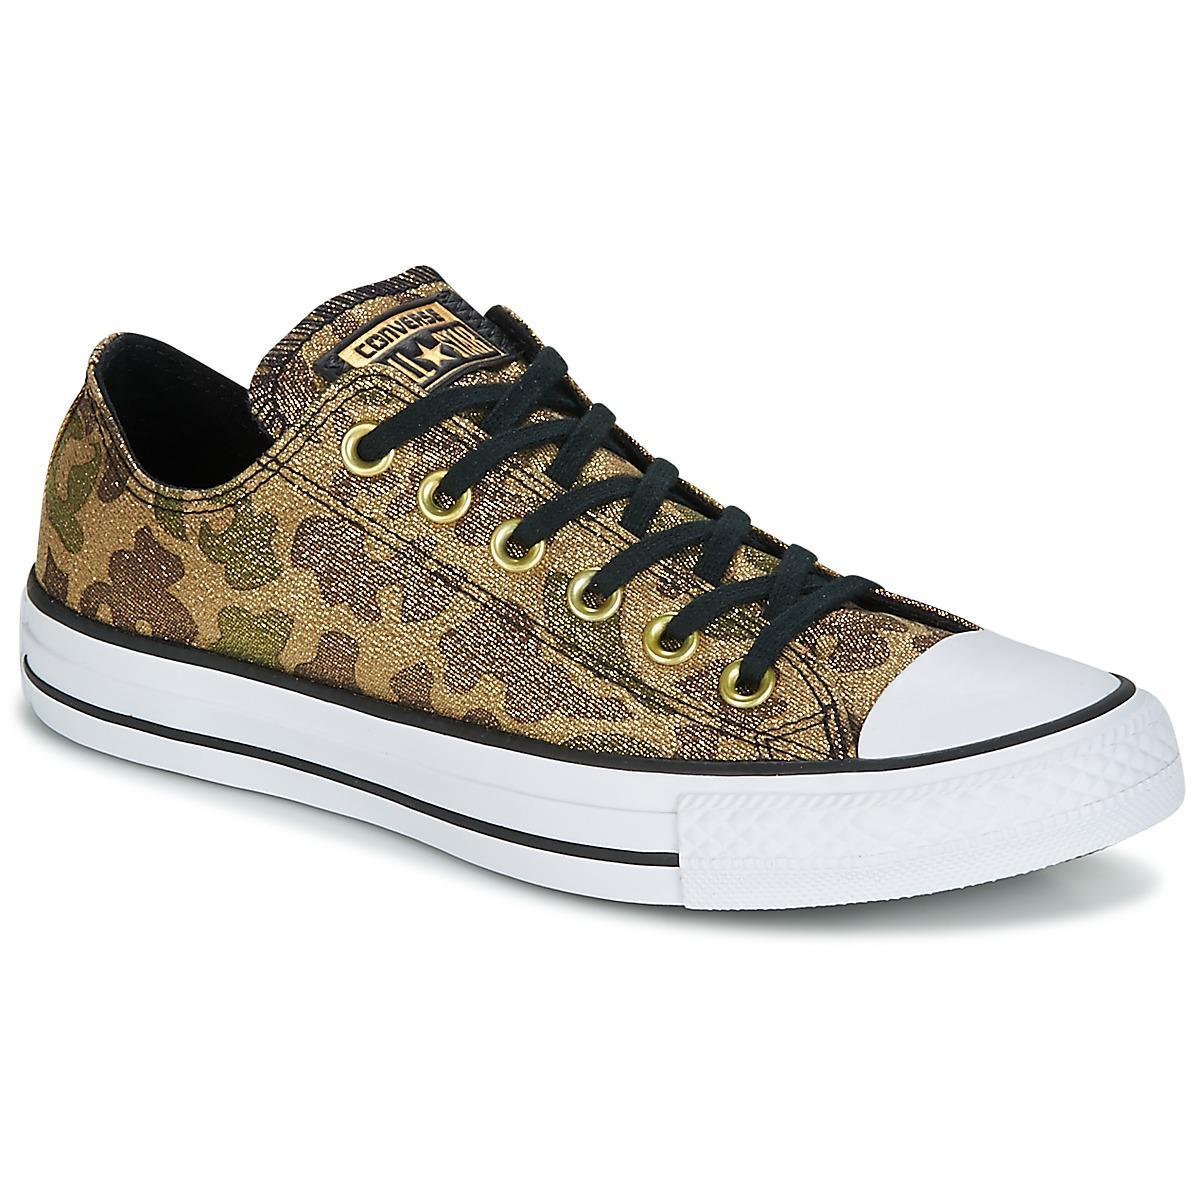 Converse Chuck Taylor All Star Ox Lurex Camo Women s Shoes (trainers ... b5c19e6673